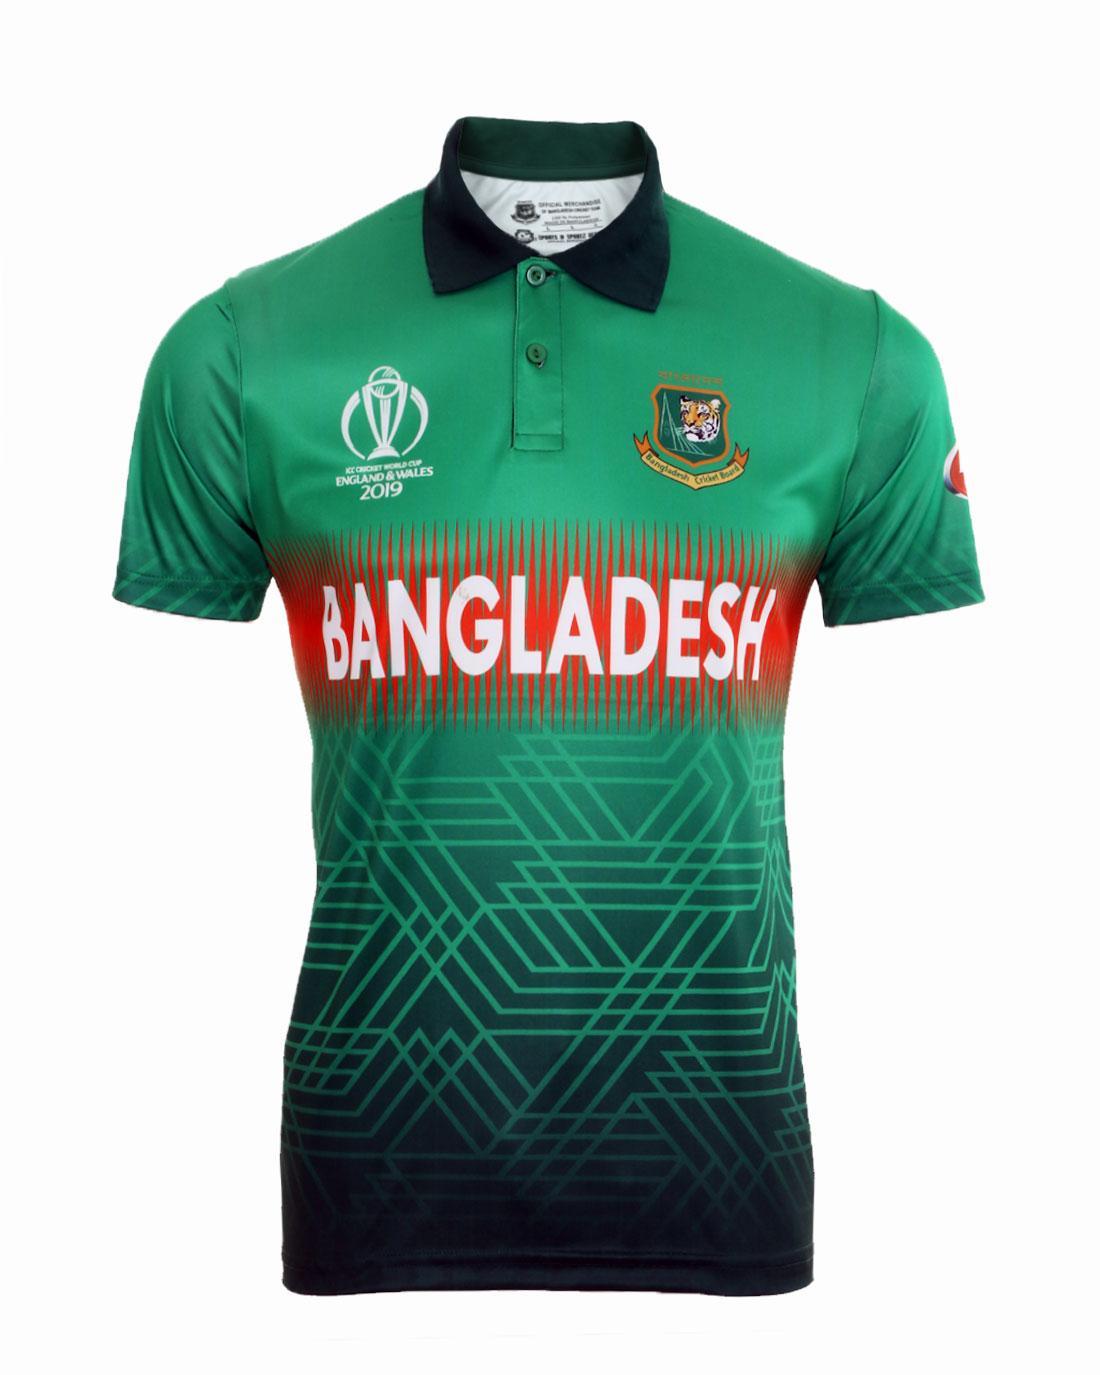 13f78587797 Jersey Price In Bangladesh - Buy Football Jerseys From Daraz.com.bd